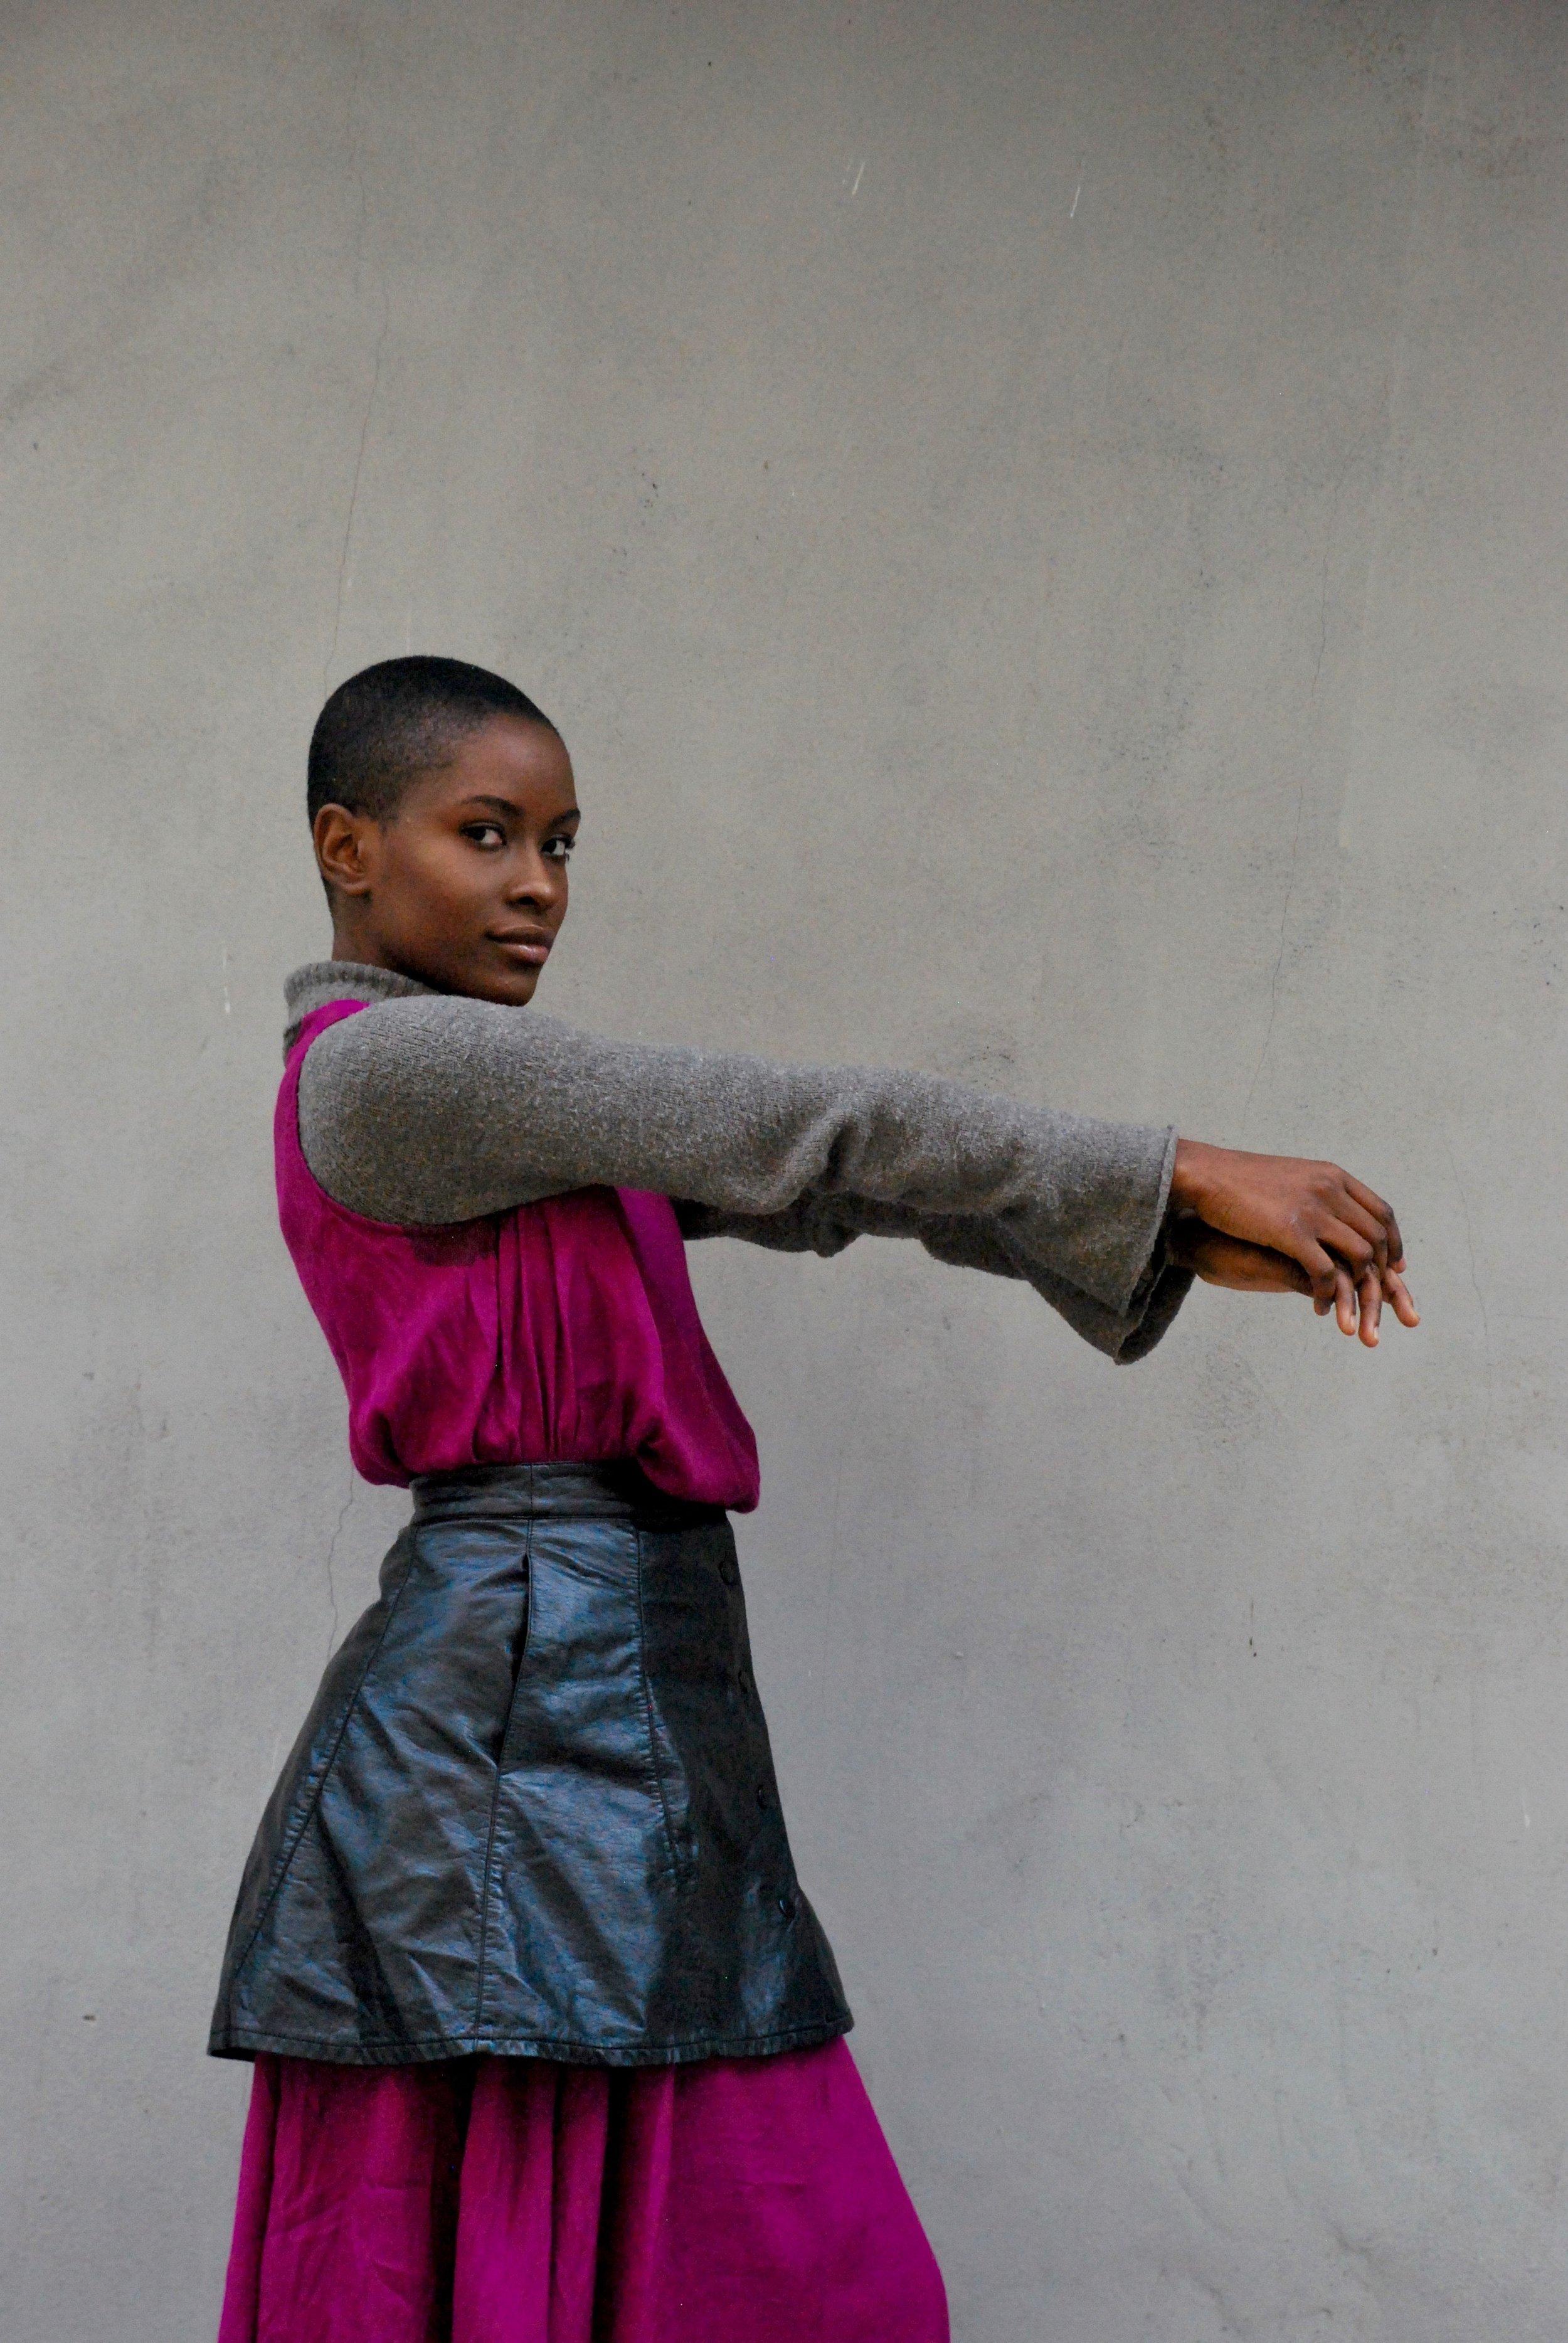 Model & Activist Rubi Photographed by Sola Onitiri